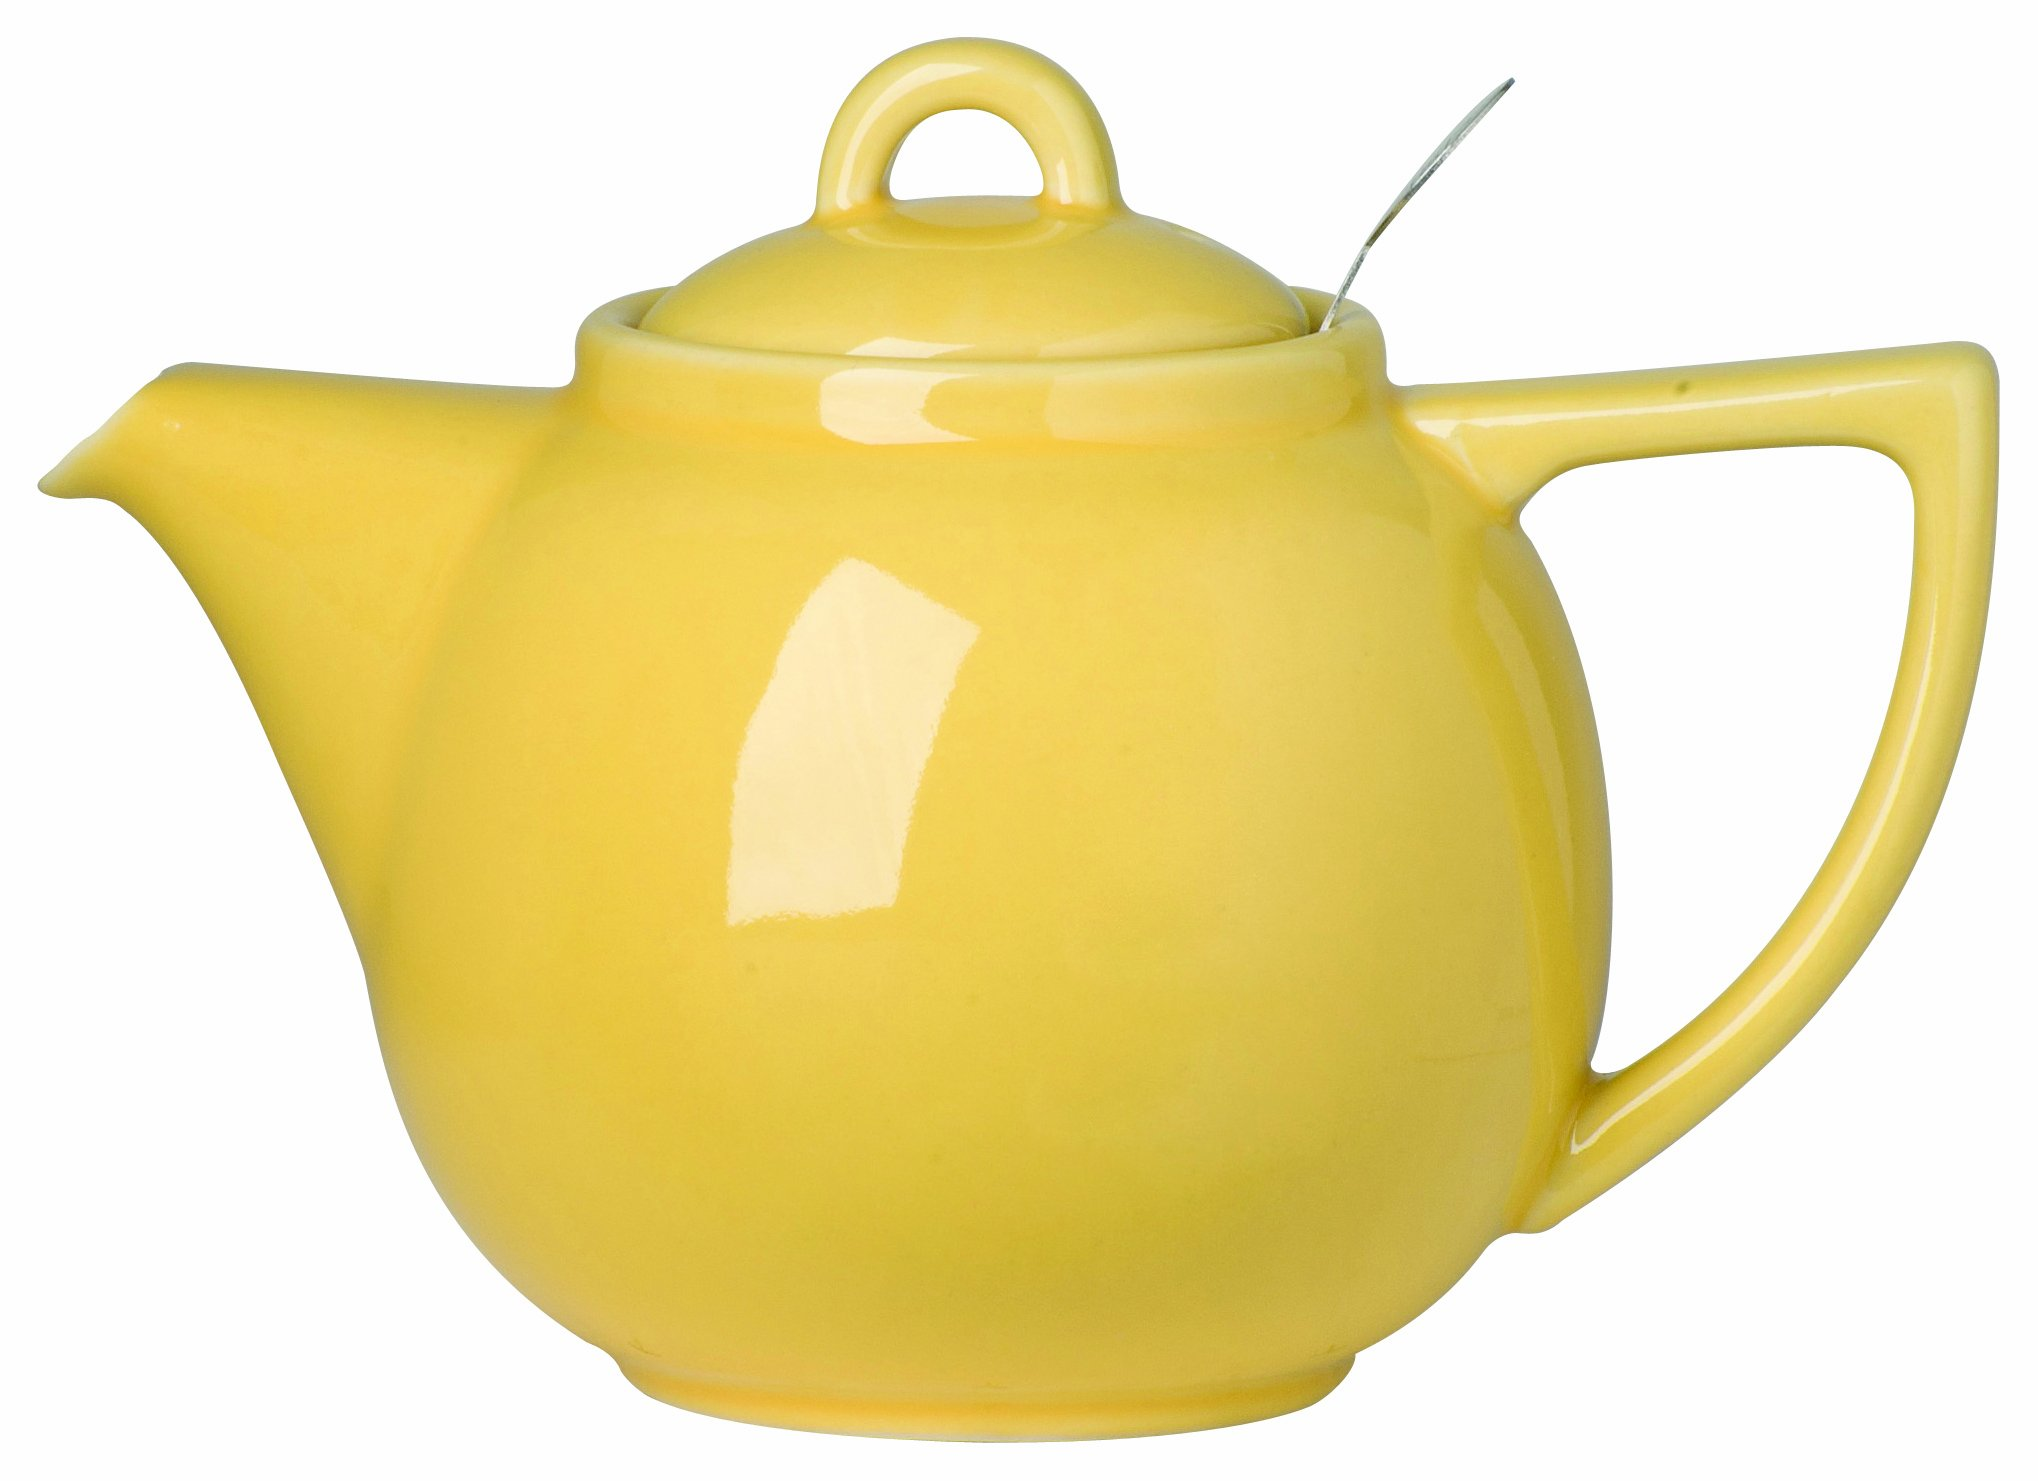 Teapot clipart london Pottery London Lemon Cup Yellow